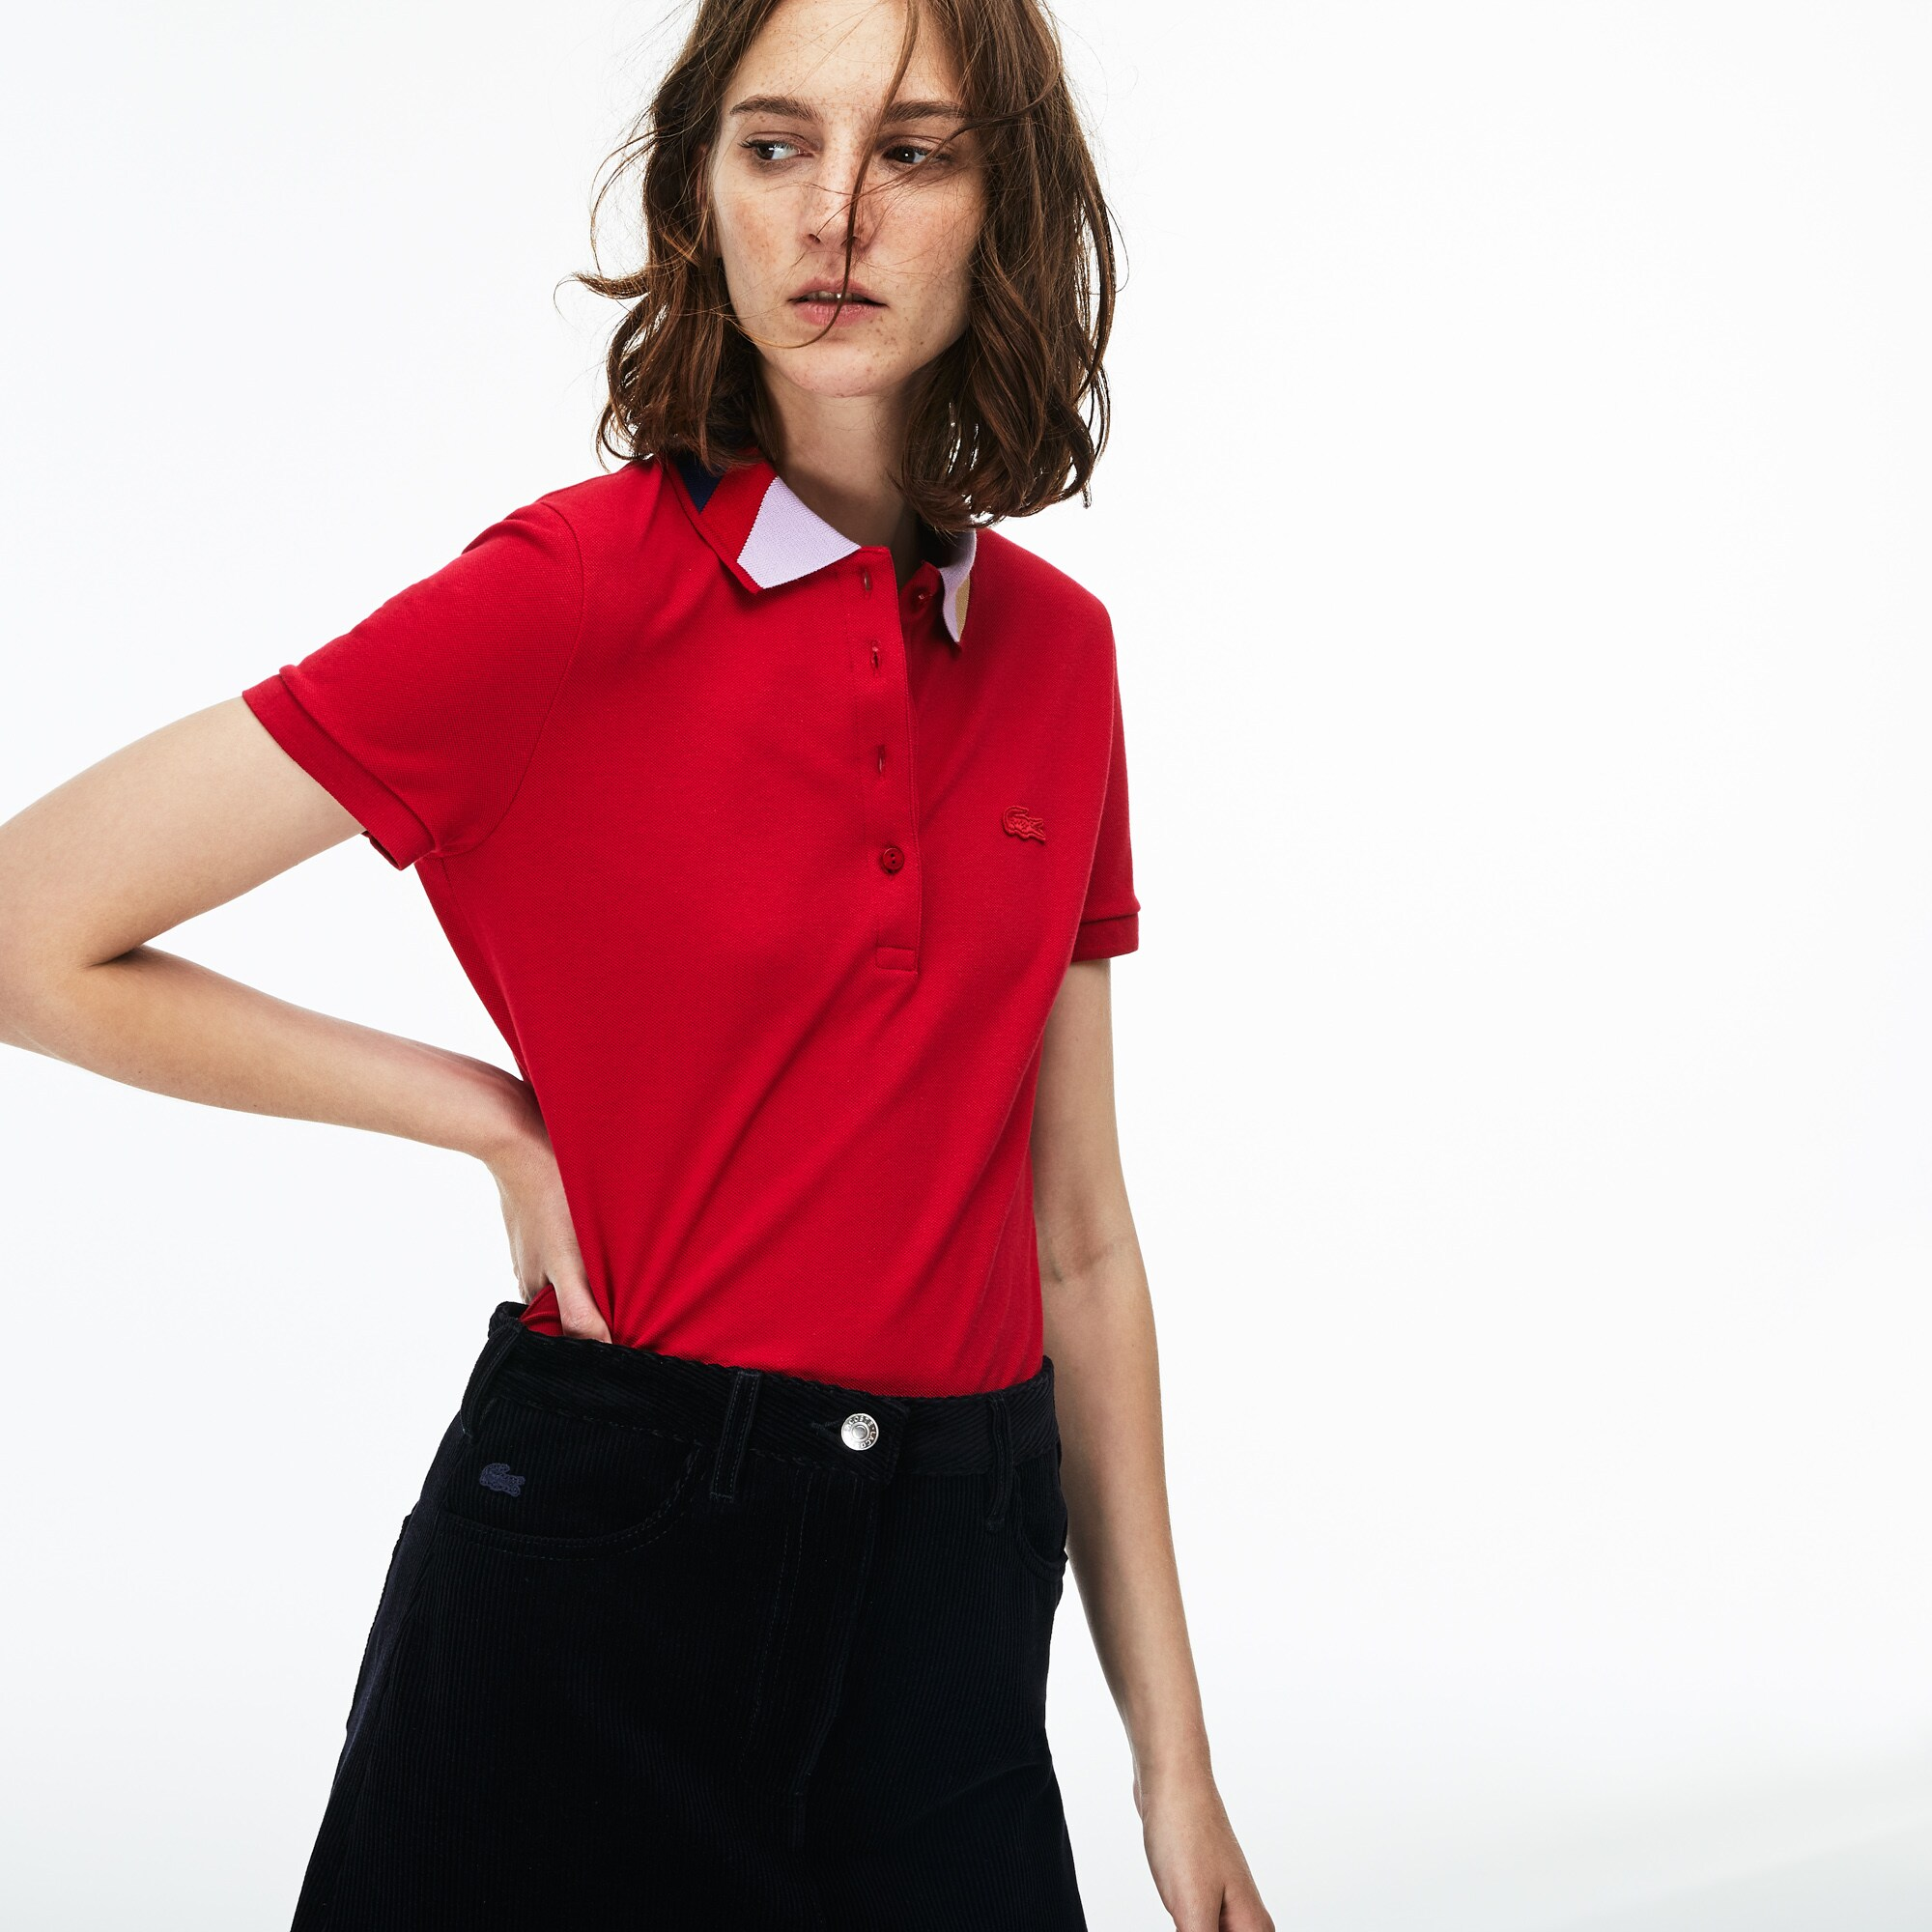 Damen LACOSTE Slim Fit Poloshirt mit Colorblock Kragen